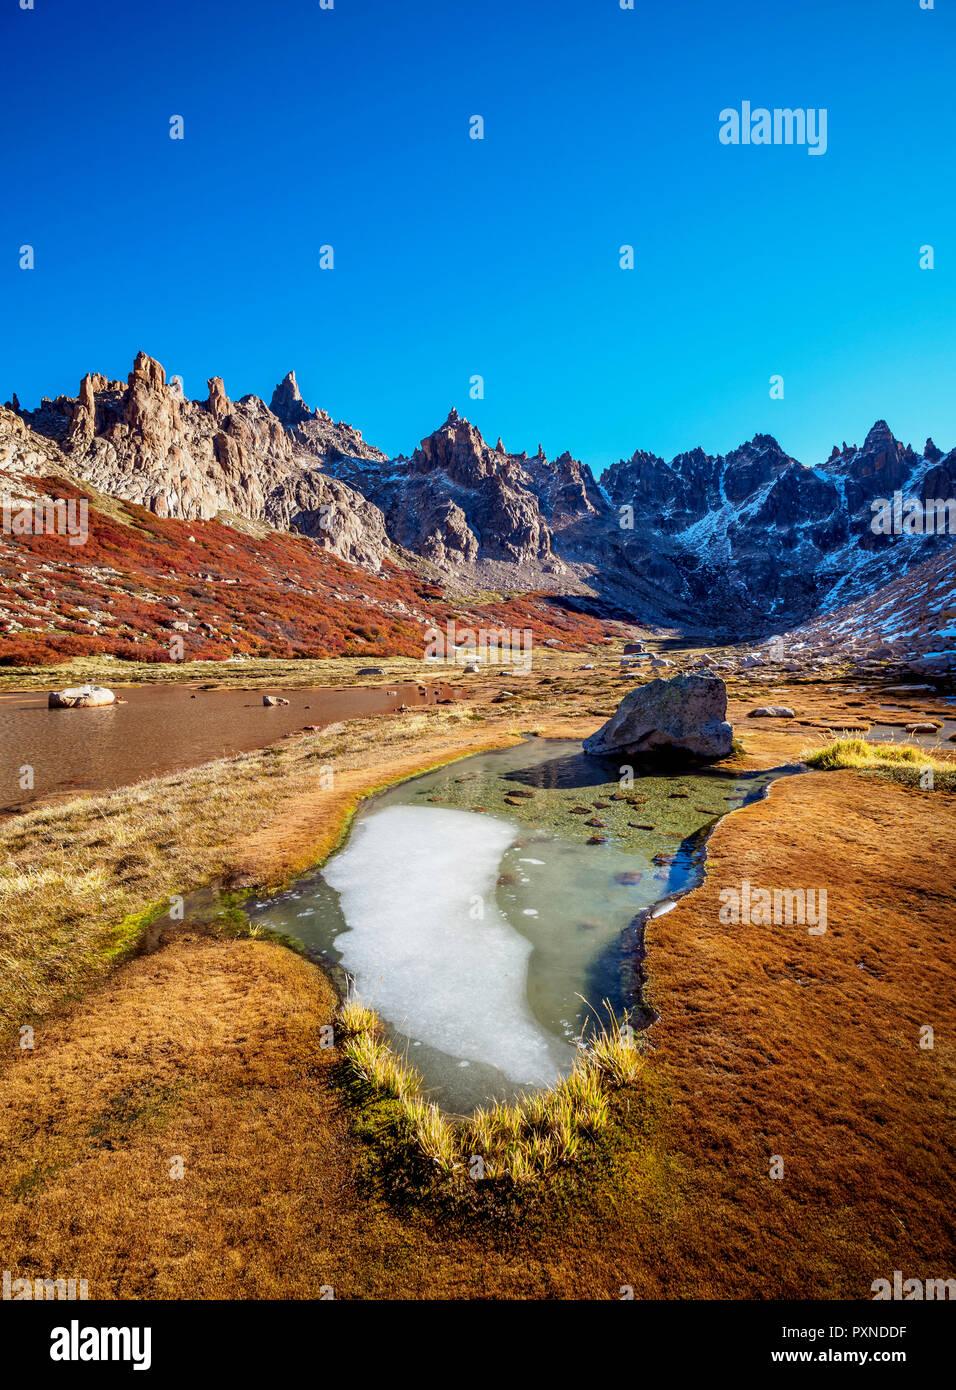 Toncek Lagoon and Cerro Catedral, Nahuel Huapi National Park, Rio Negro Province, Argentina - Stock Image